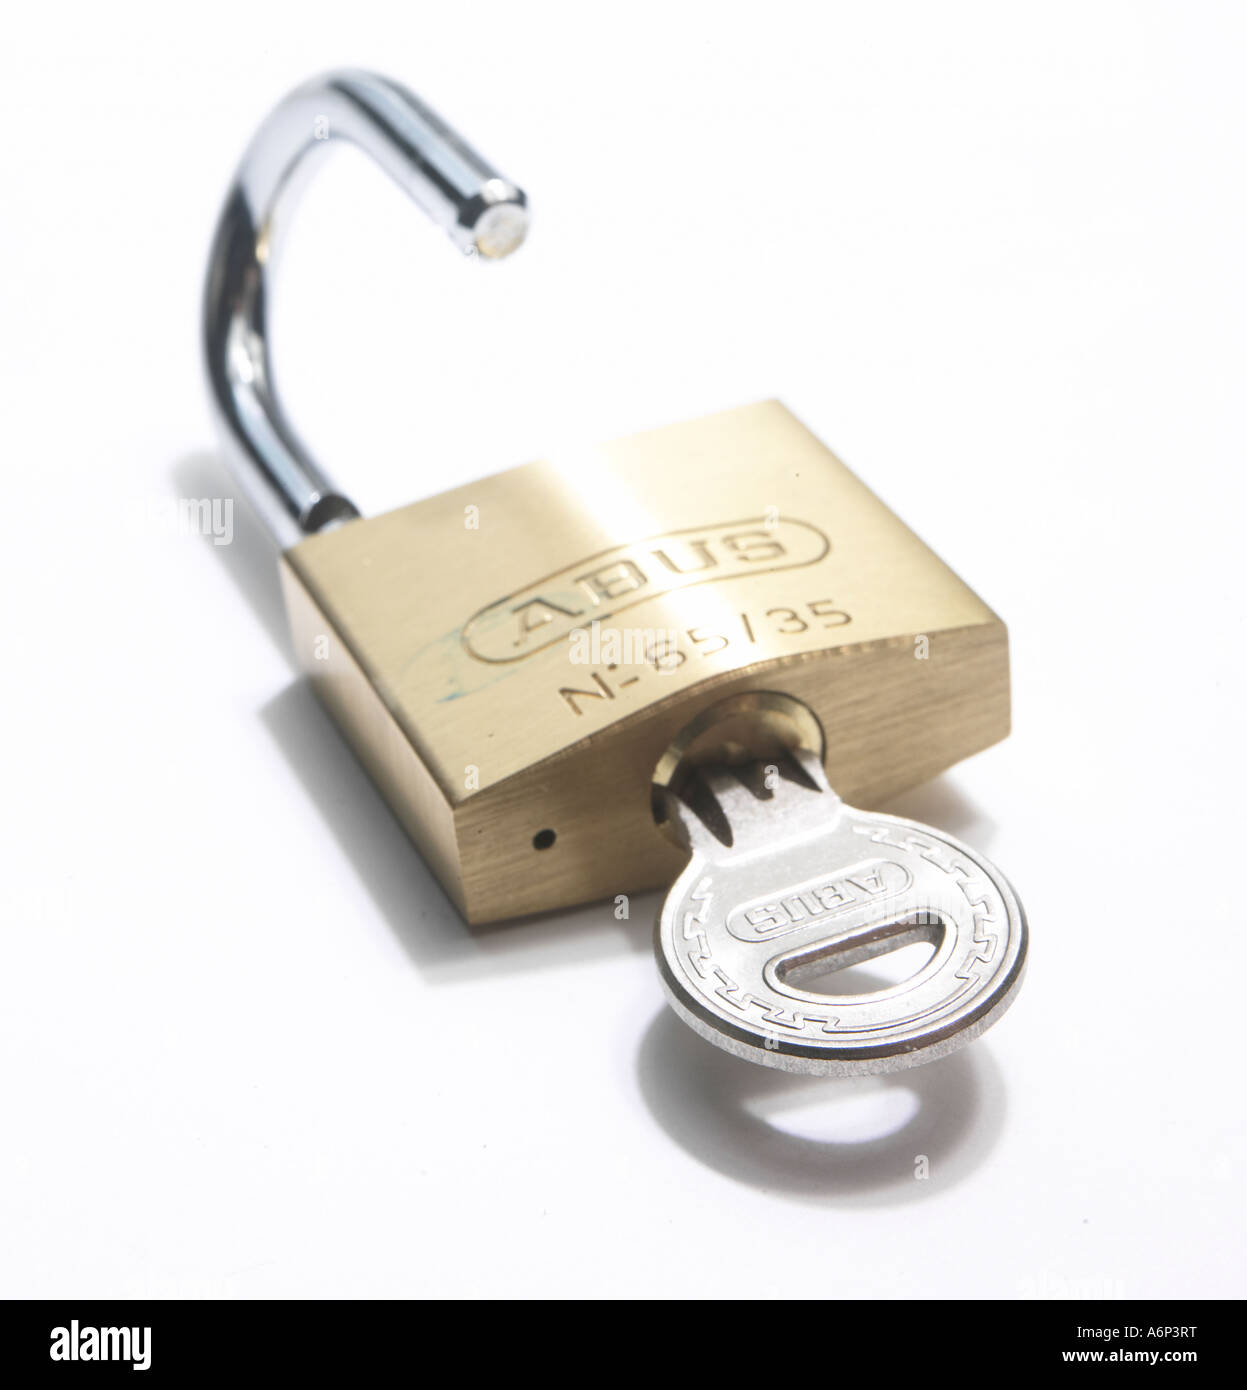 Candado desbloqueado por llave Imagen De Stock